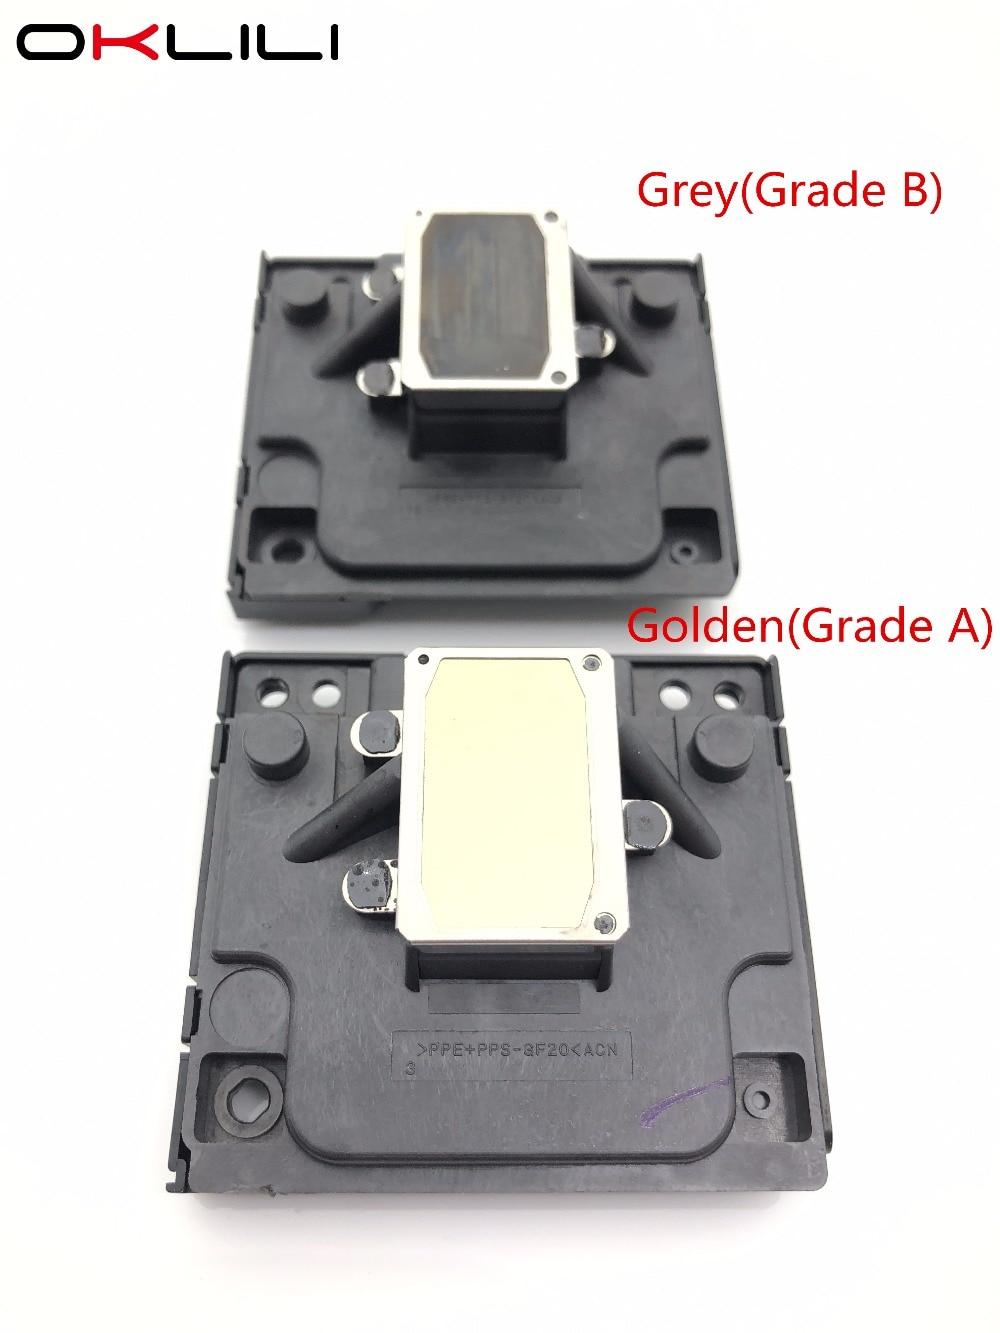 F181010 Printhead Print Head for Epson ME510 L101 L201 L100 ME32 C90 T11 T13 T20E L200 ME340 TX100 TX101 TX105 TX110 TX111 TX121